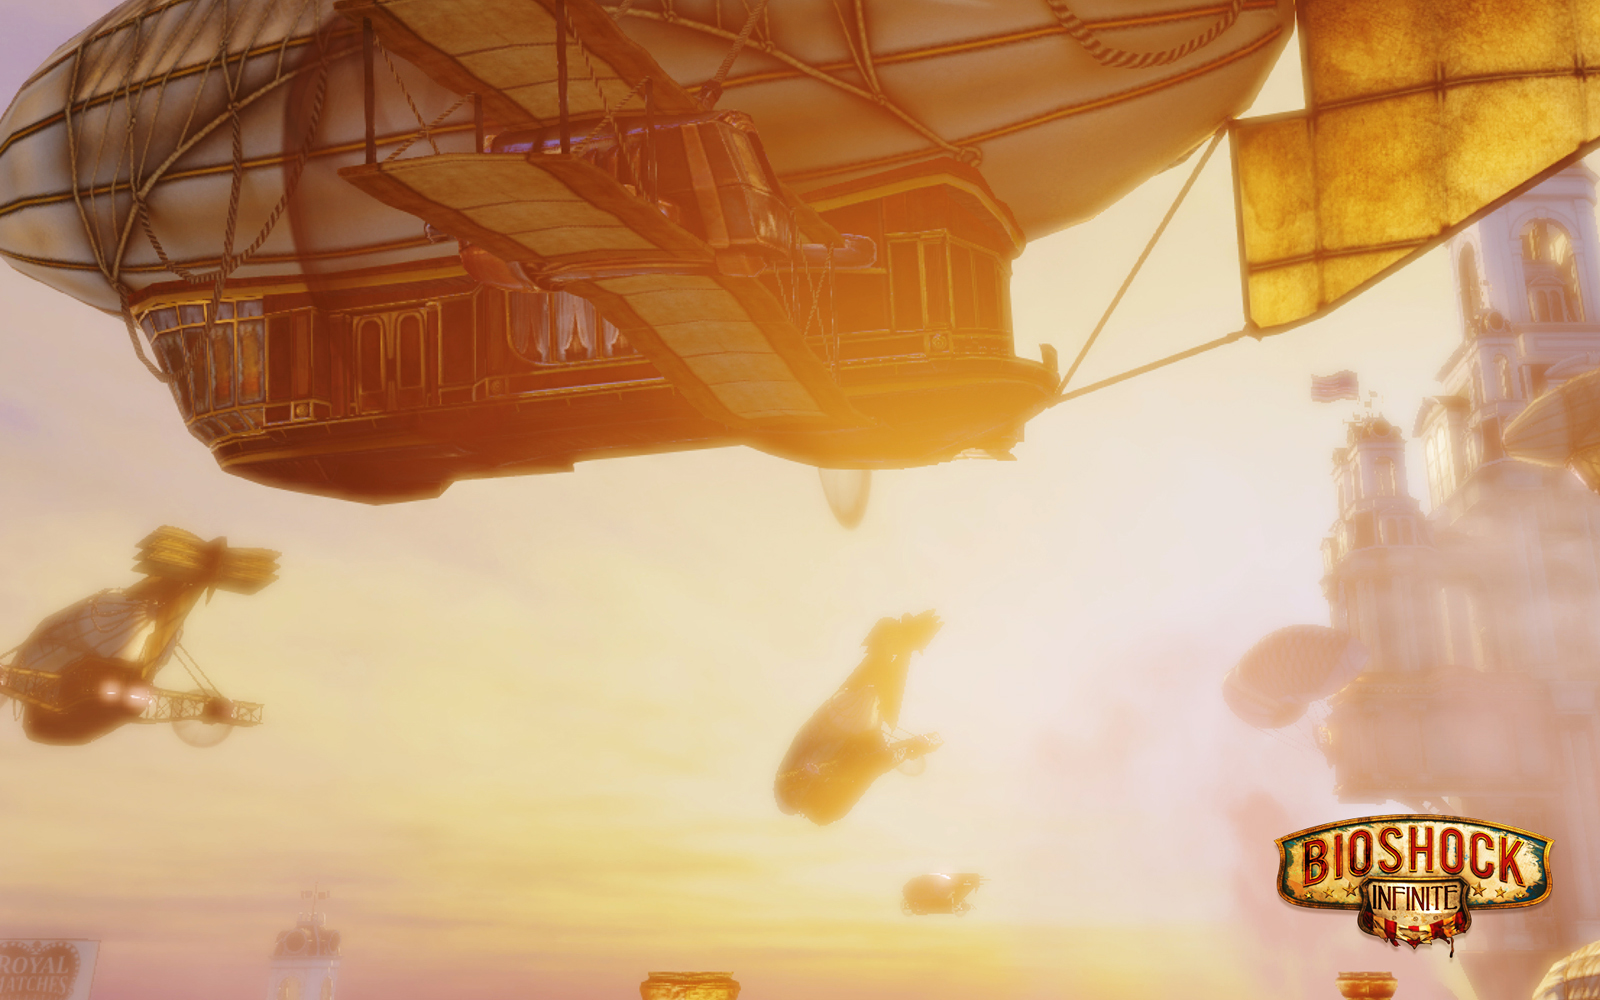 http://1.bp.blogspot.com/-mBd4EbvMTJo/UJgG3U8L4RI/AAAAAAAAF00/uMBABFo2BIg/s1600/Bioshock-Infinite-Zeppelin-HD-Wallpaper_Vvallpaper.Net.jpg